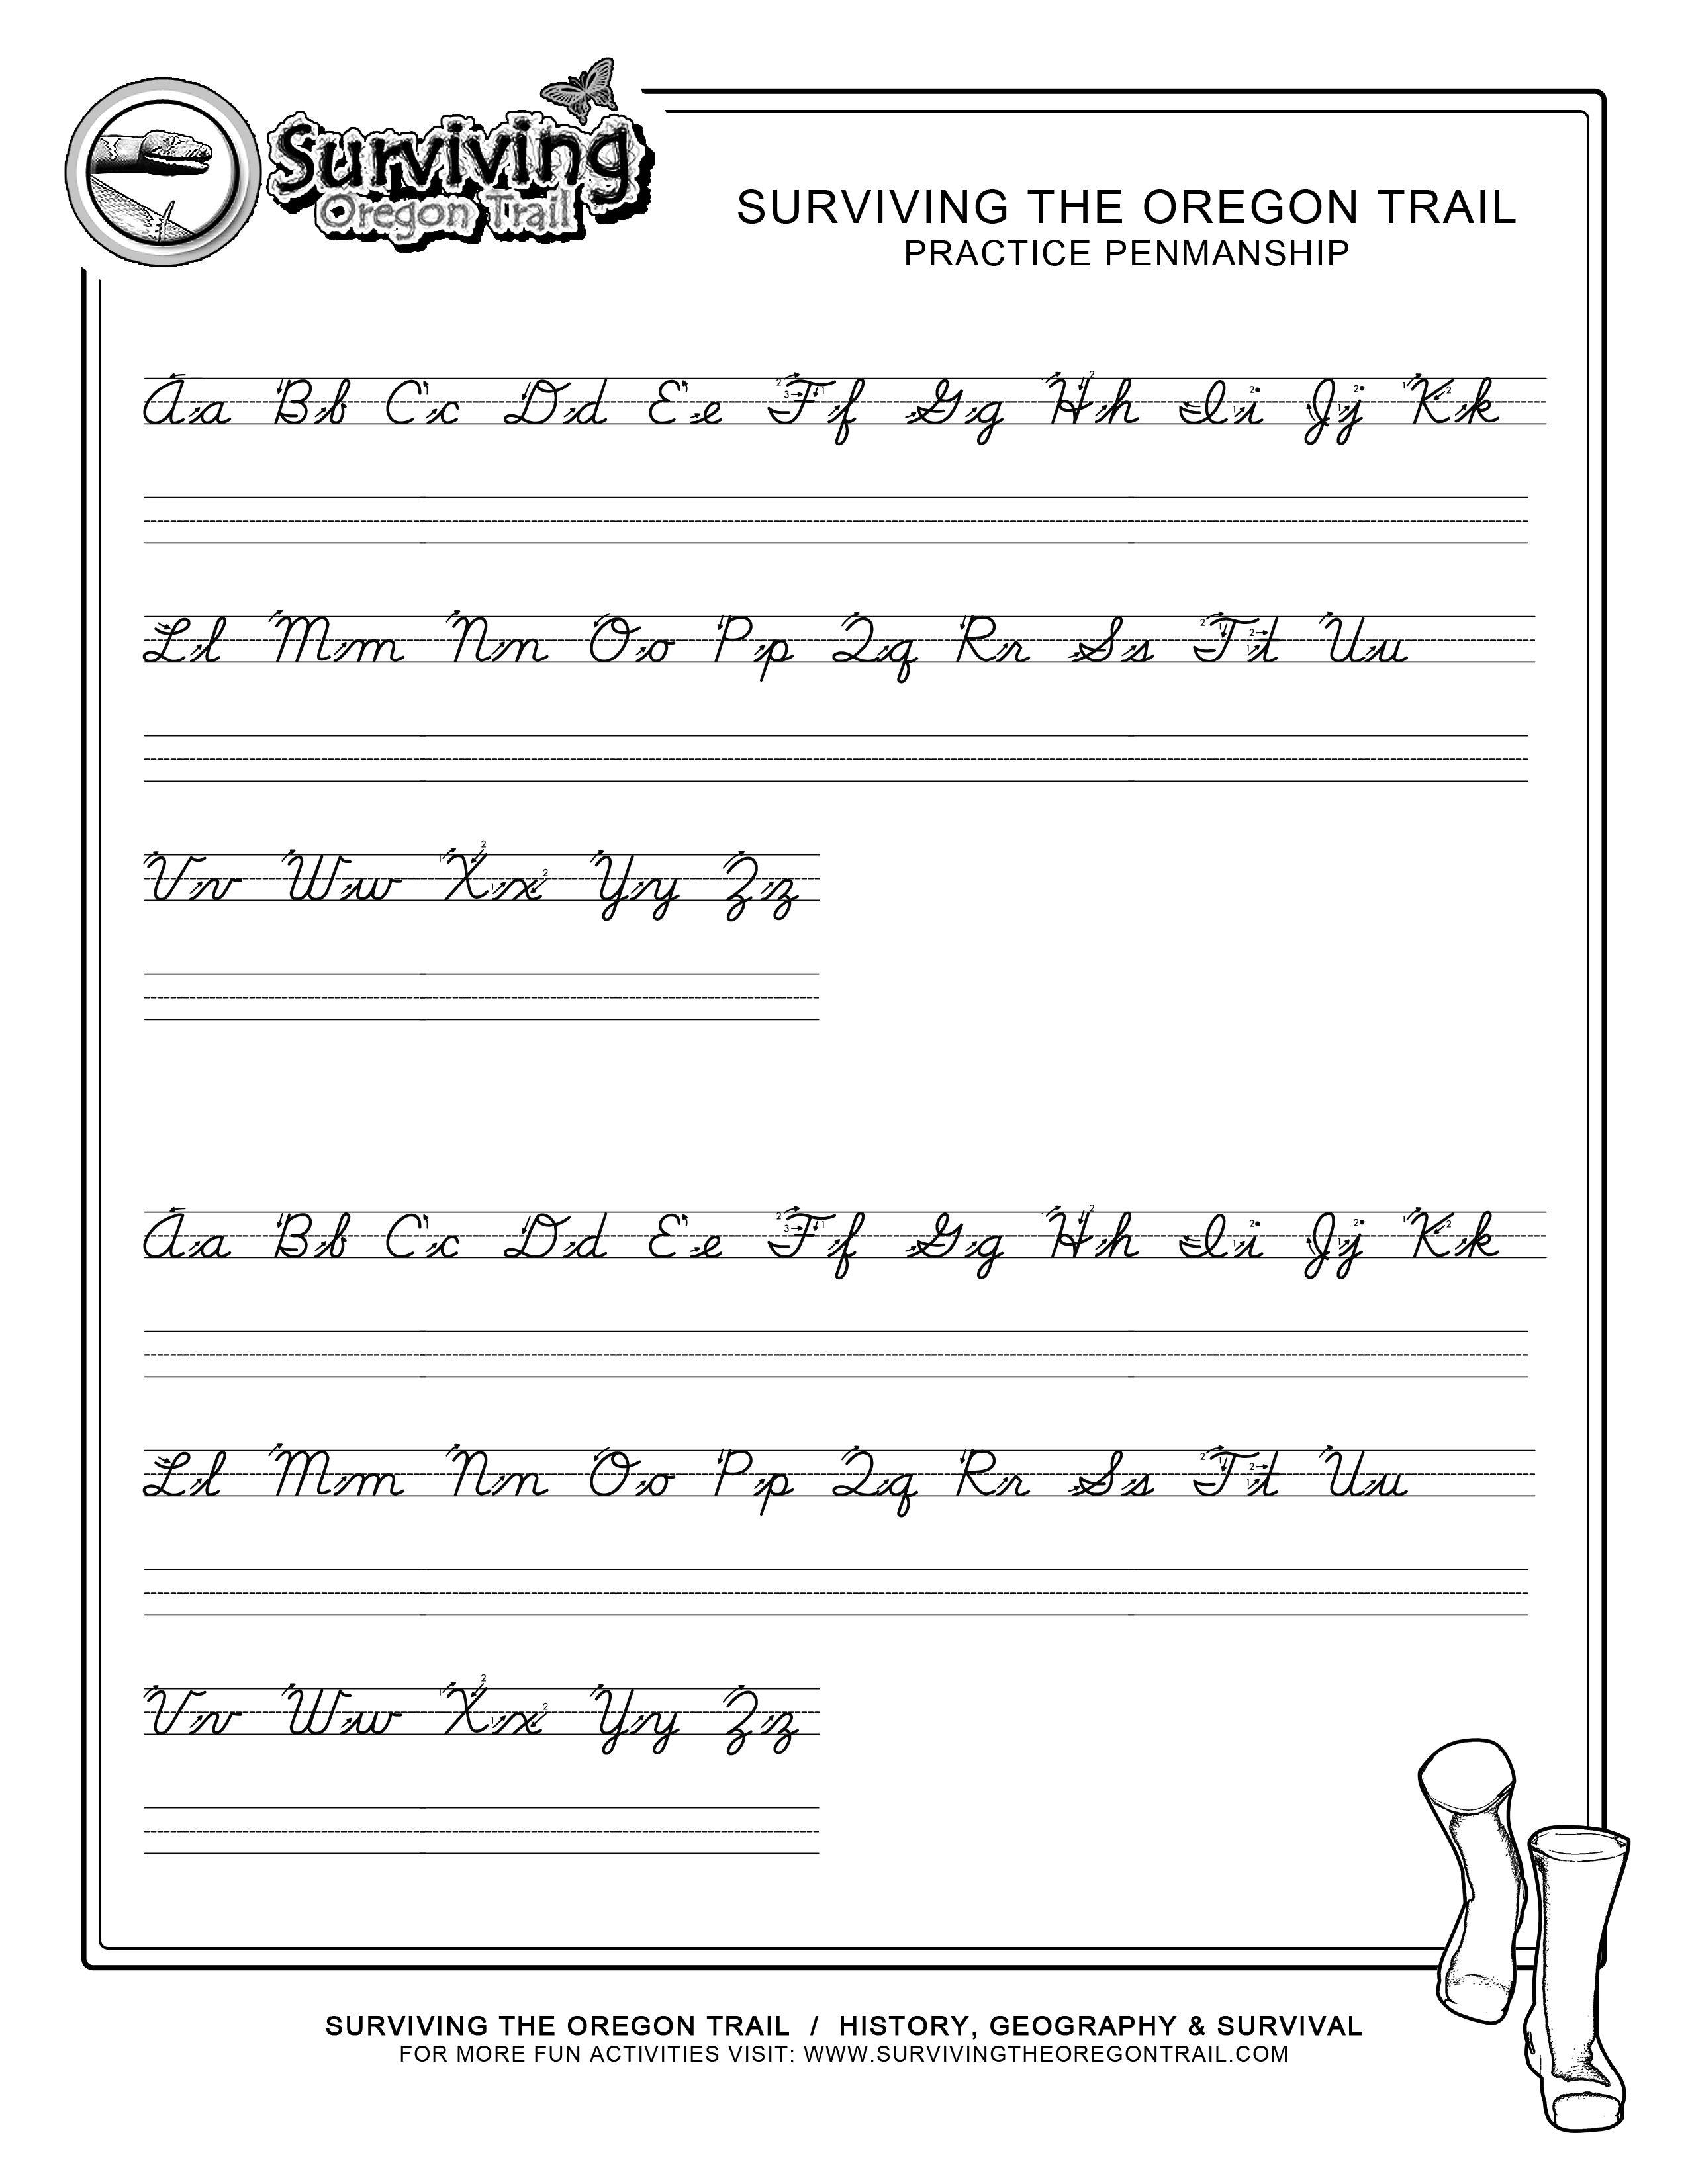 Practice Penmanship – Free Abc's Printable Cursive Writing Worksheet | Free Printable Handwriting Worksheets